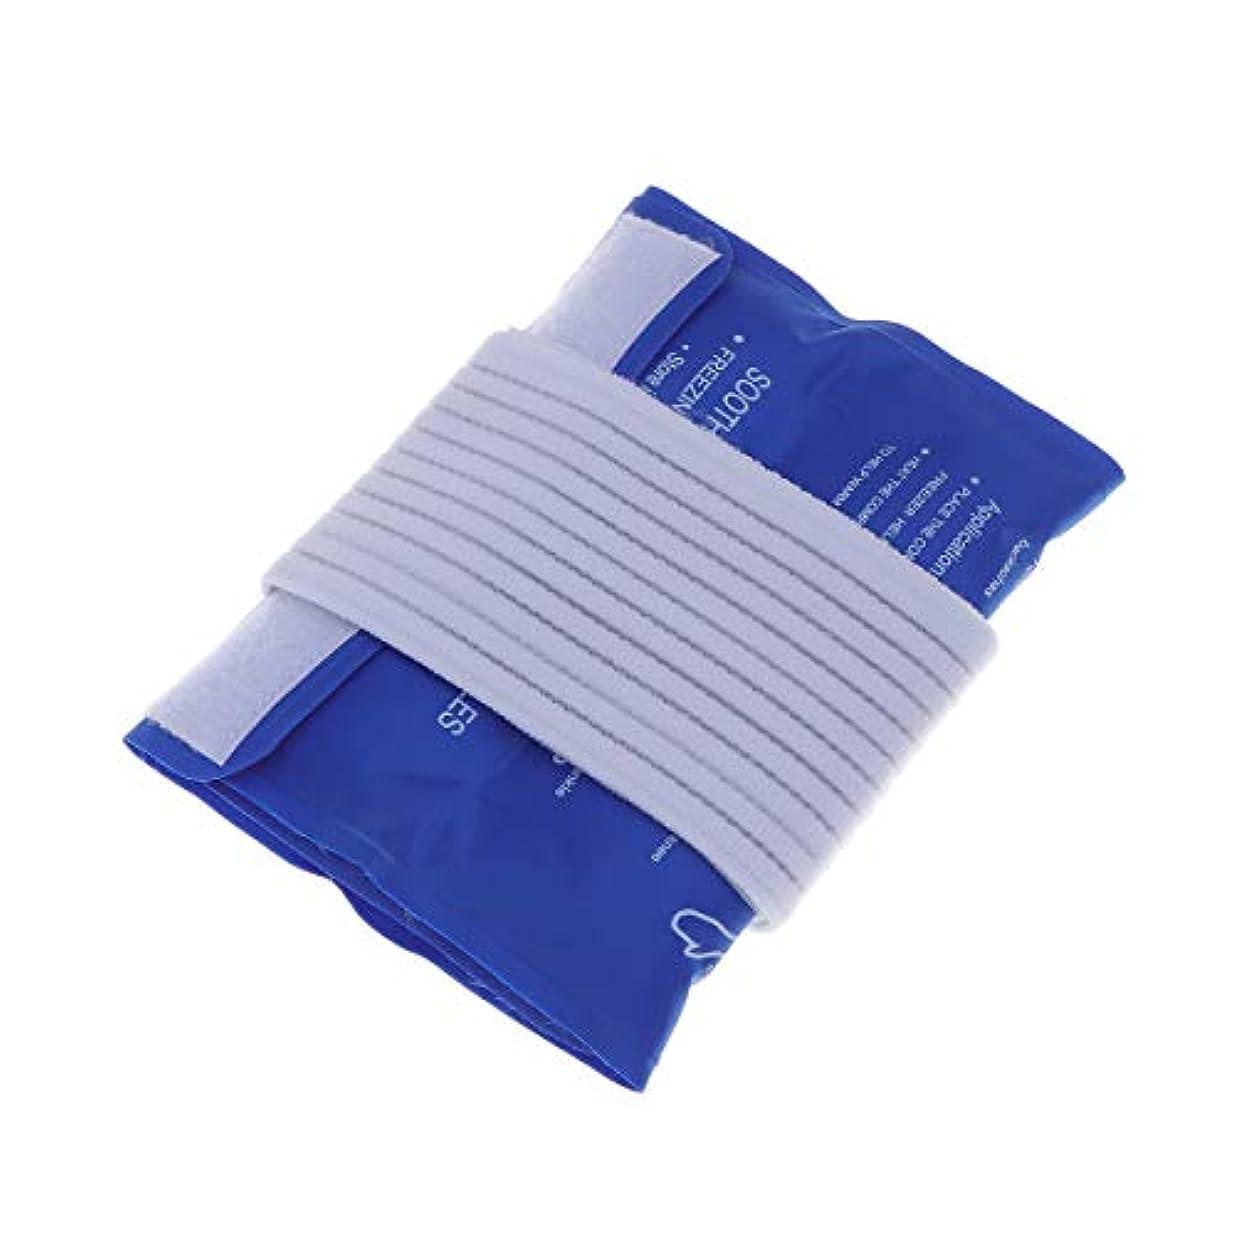 SUPVOX ゲルアイスパックラップ医療冷却コンプレッションバッグ付き調節可能な弾性ストラップ付き捻挫筋肉痛傷害ホットコールドセラピー(ブルー)